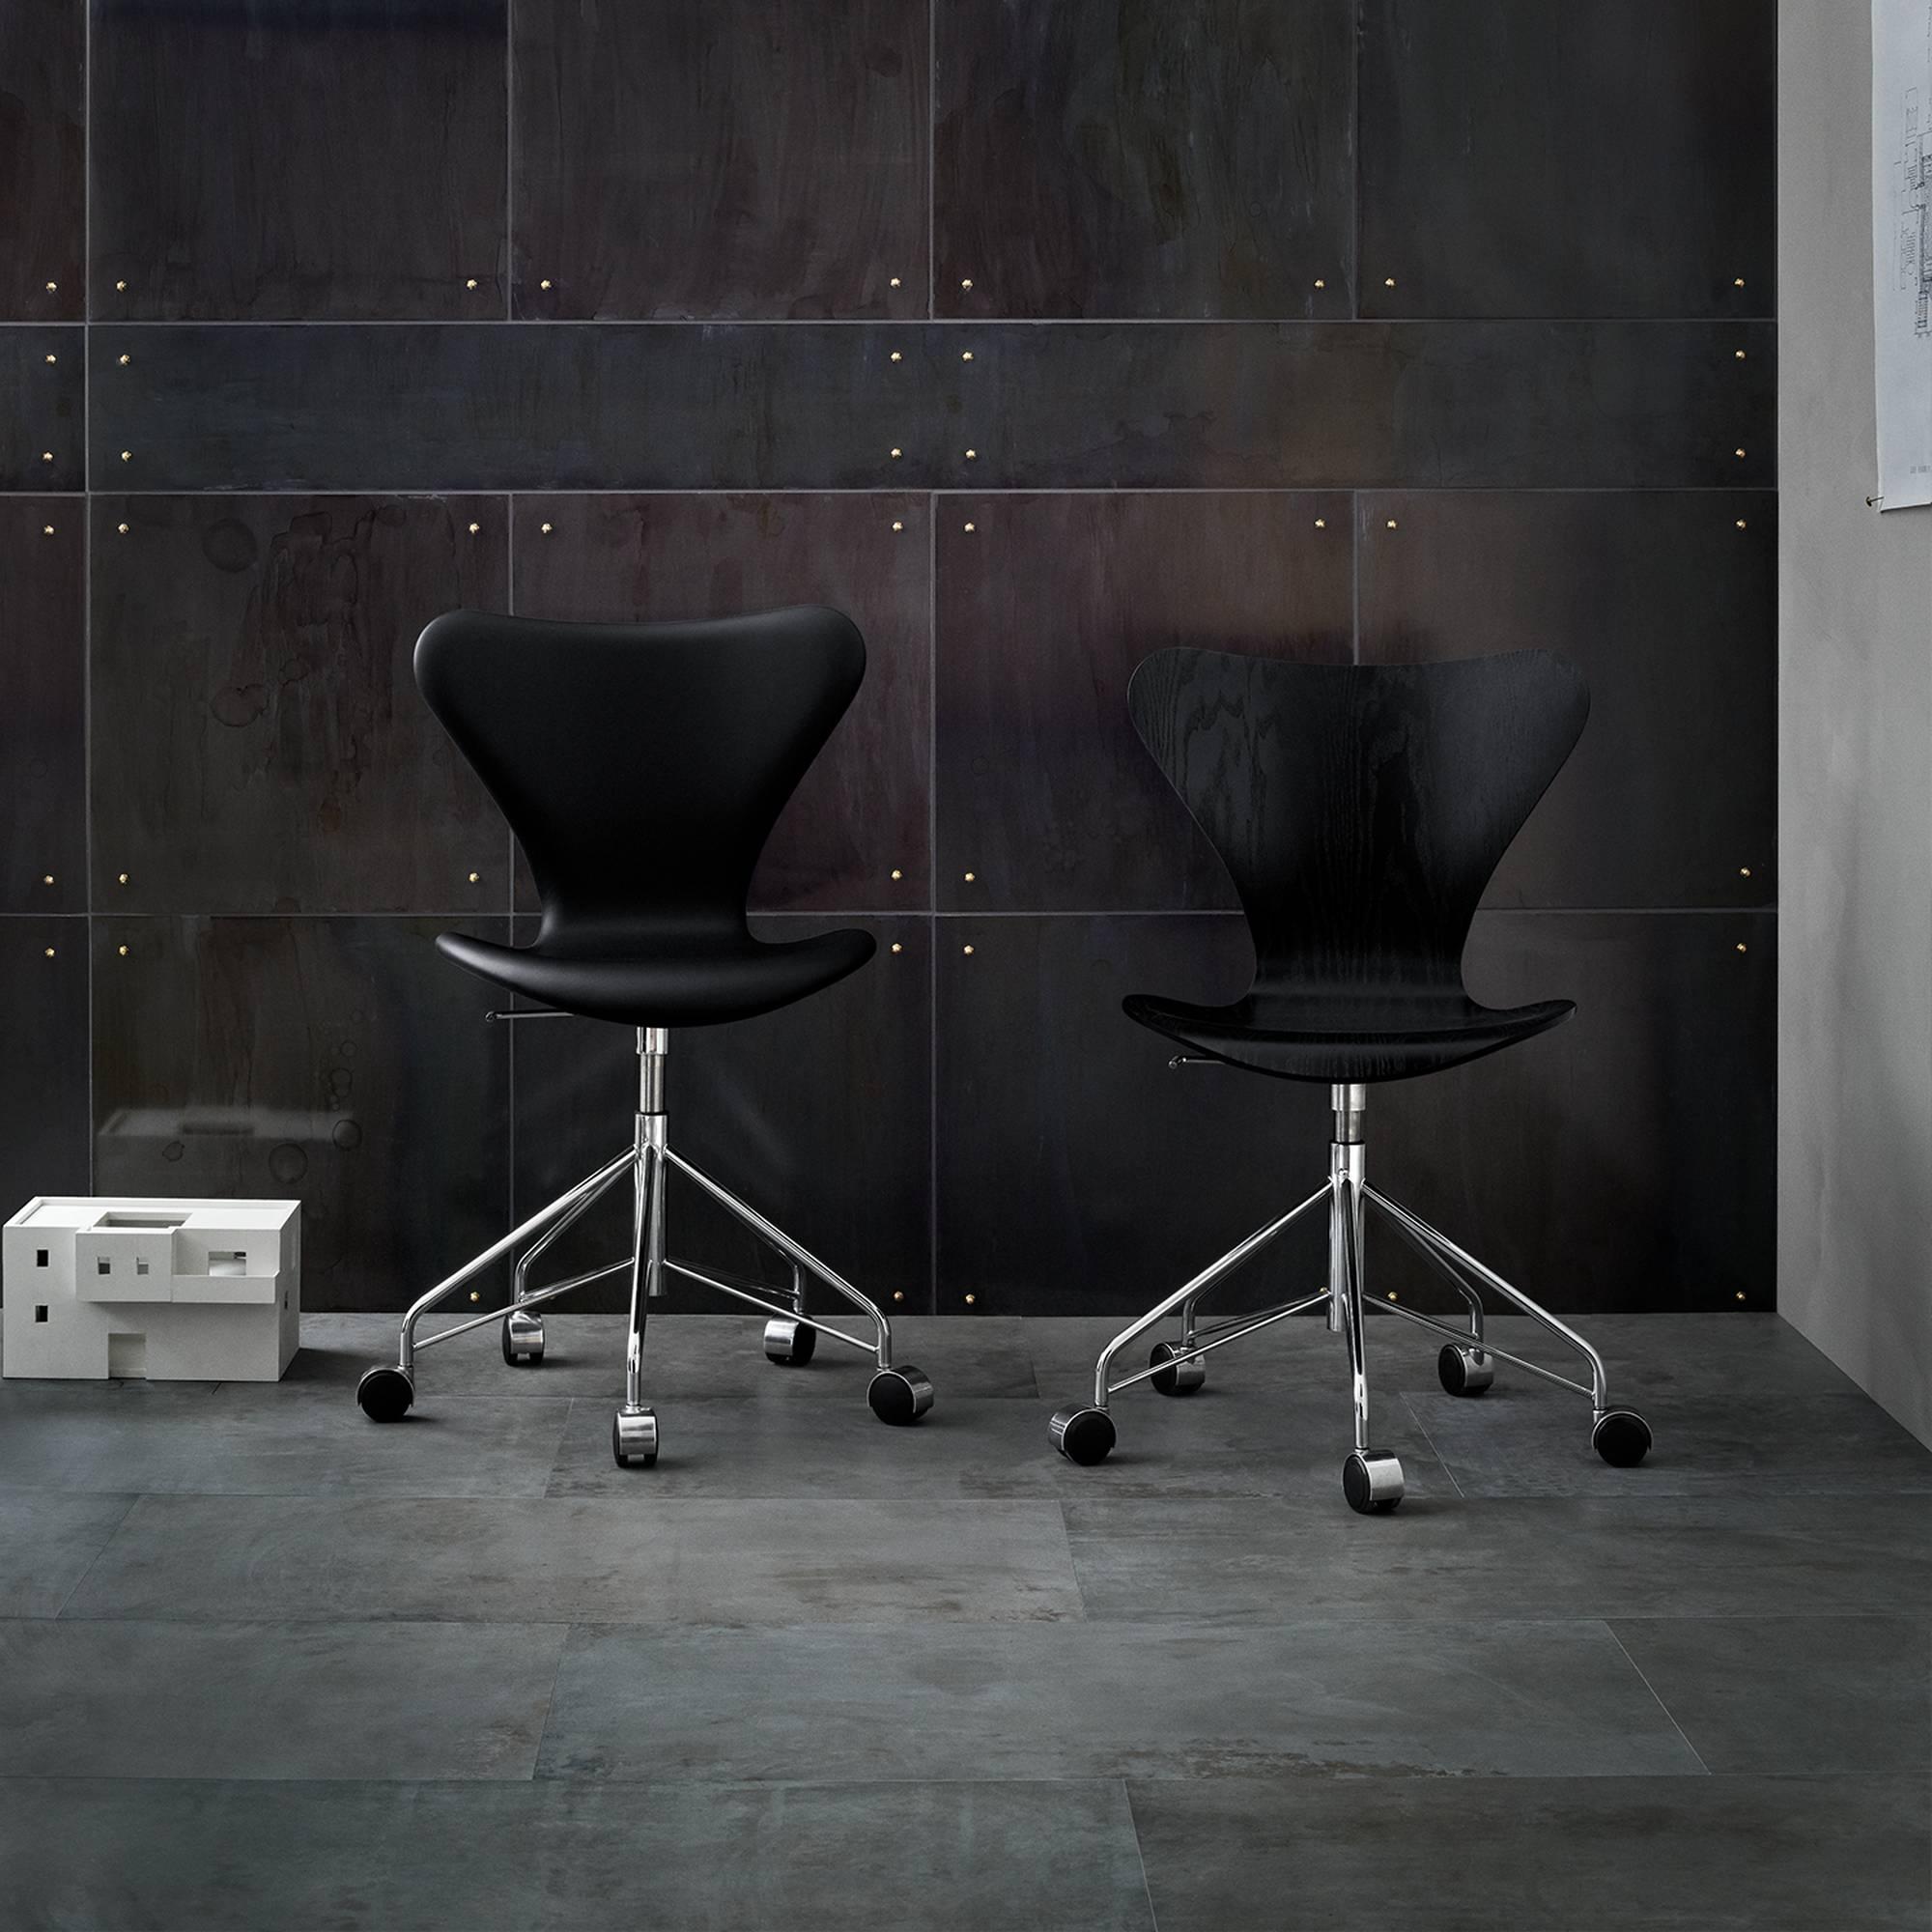 k p 3117 sjuan snurrstol fr n fritz hansen nordiska. Black Bedroom Furniture Sets. Home Design Ideas